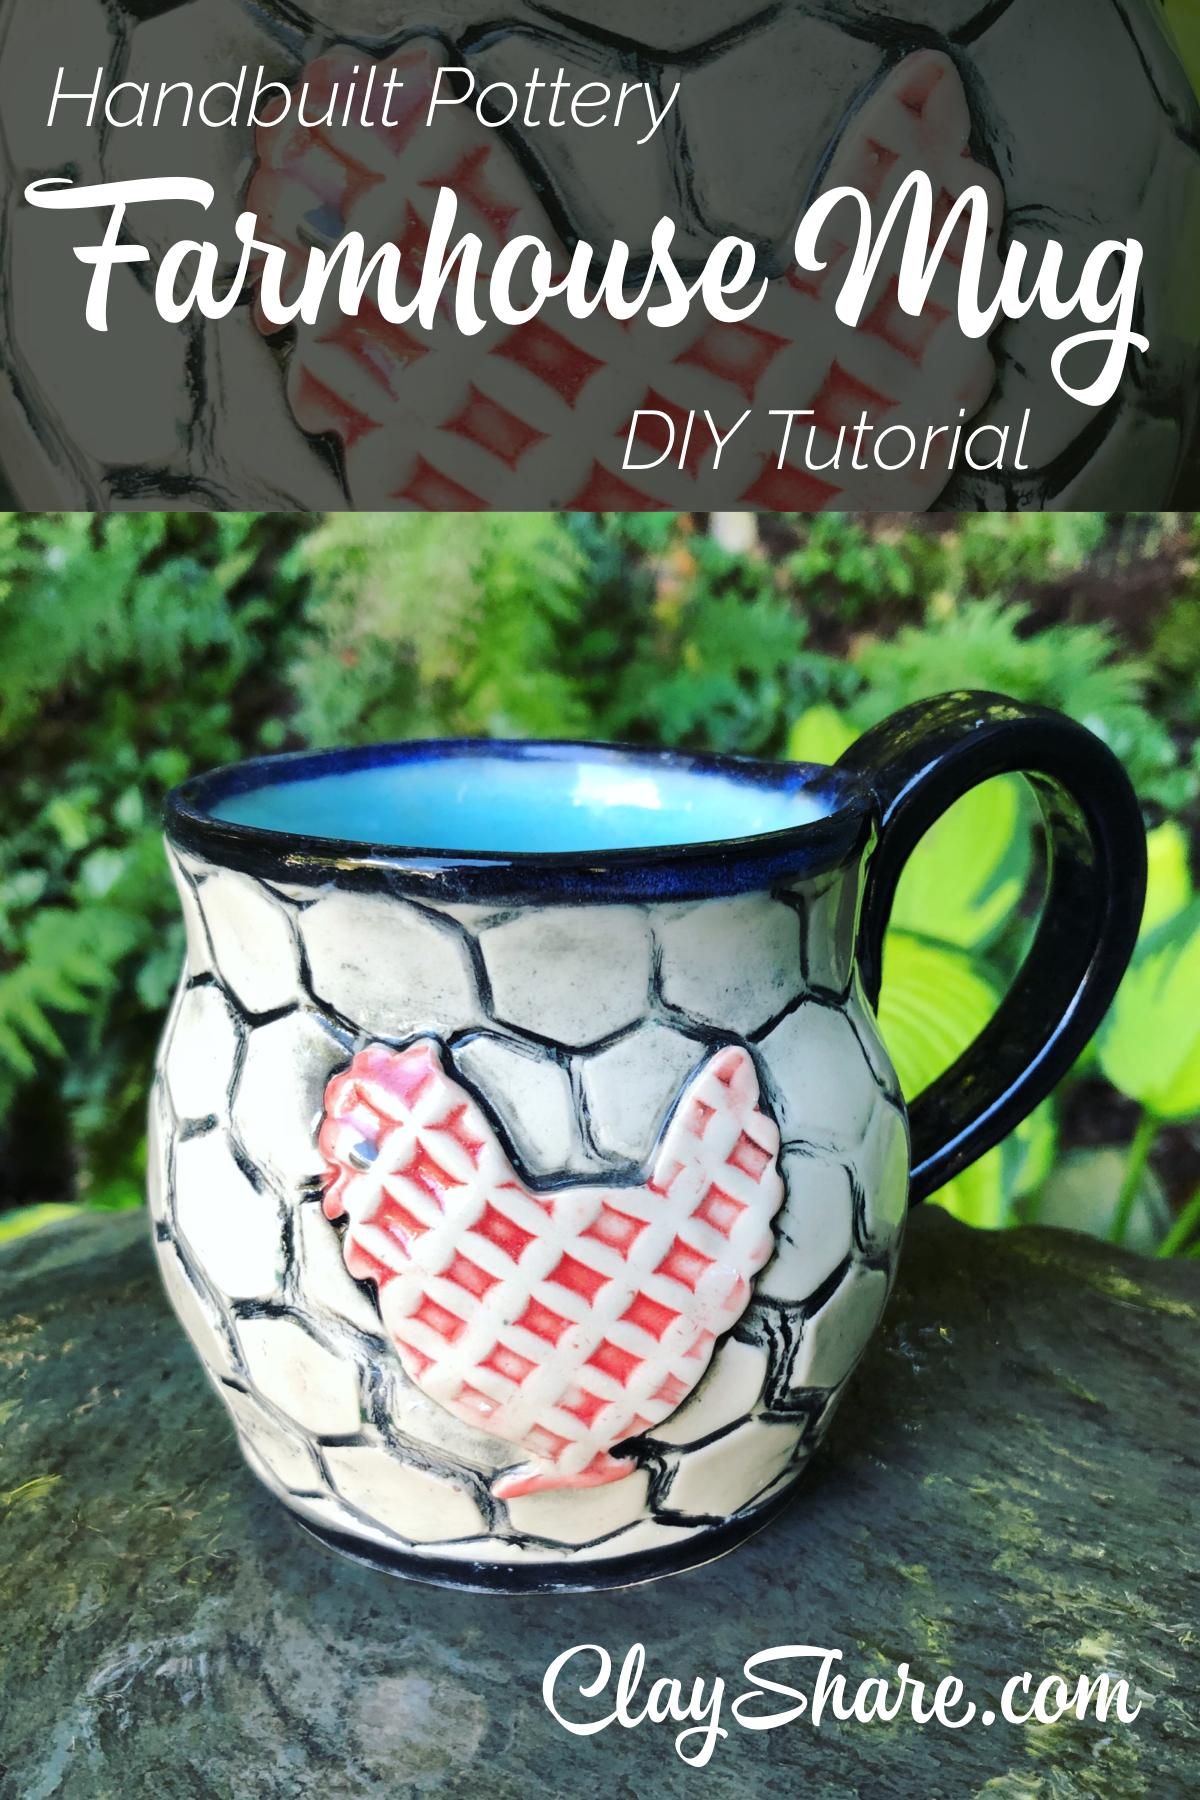 Farmhouse Mug | Coffee mugs | Farmhouse mugs, Hand built pottery, Mugs